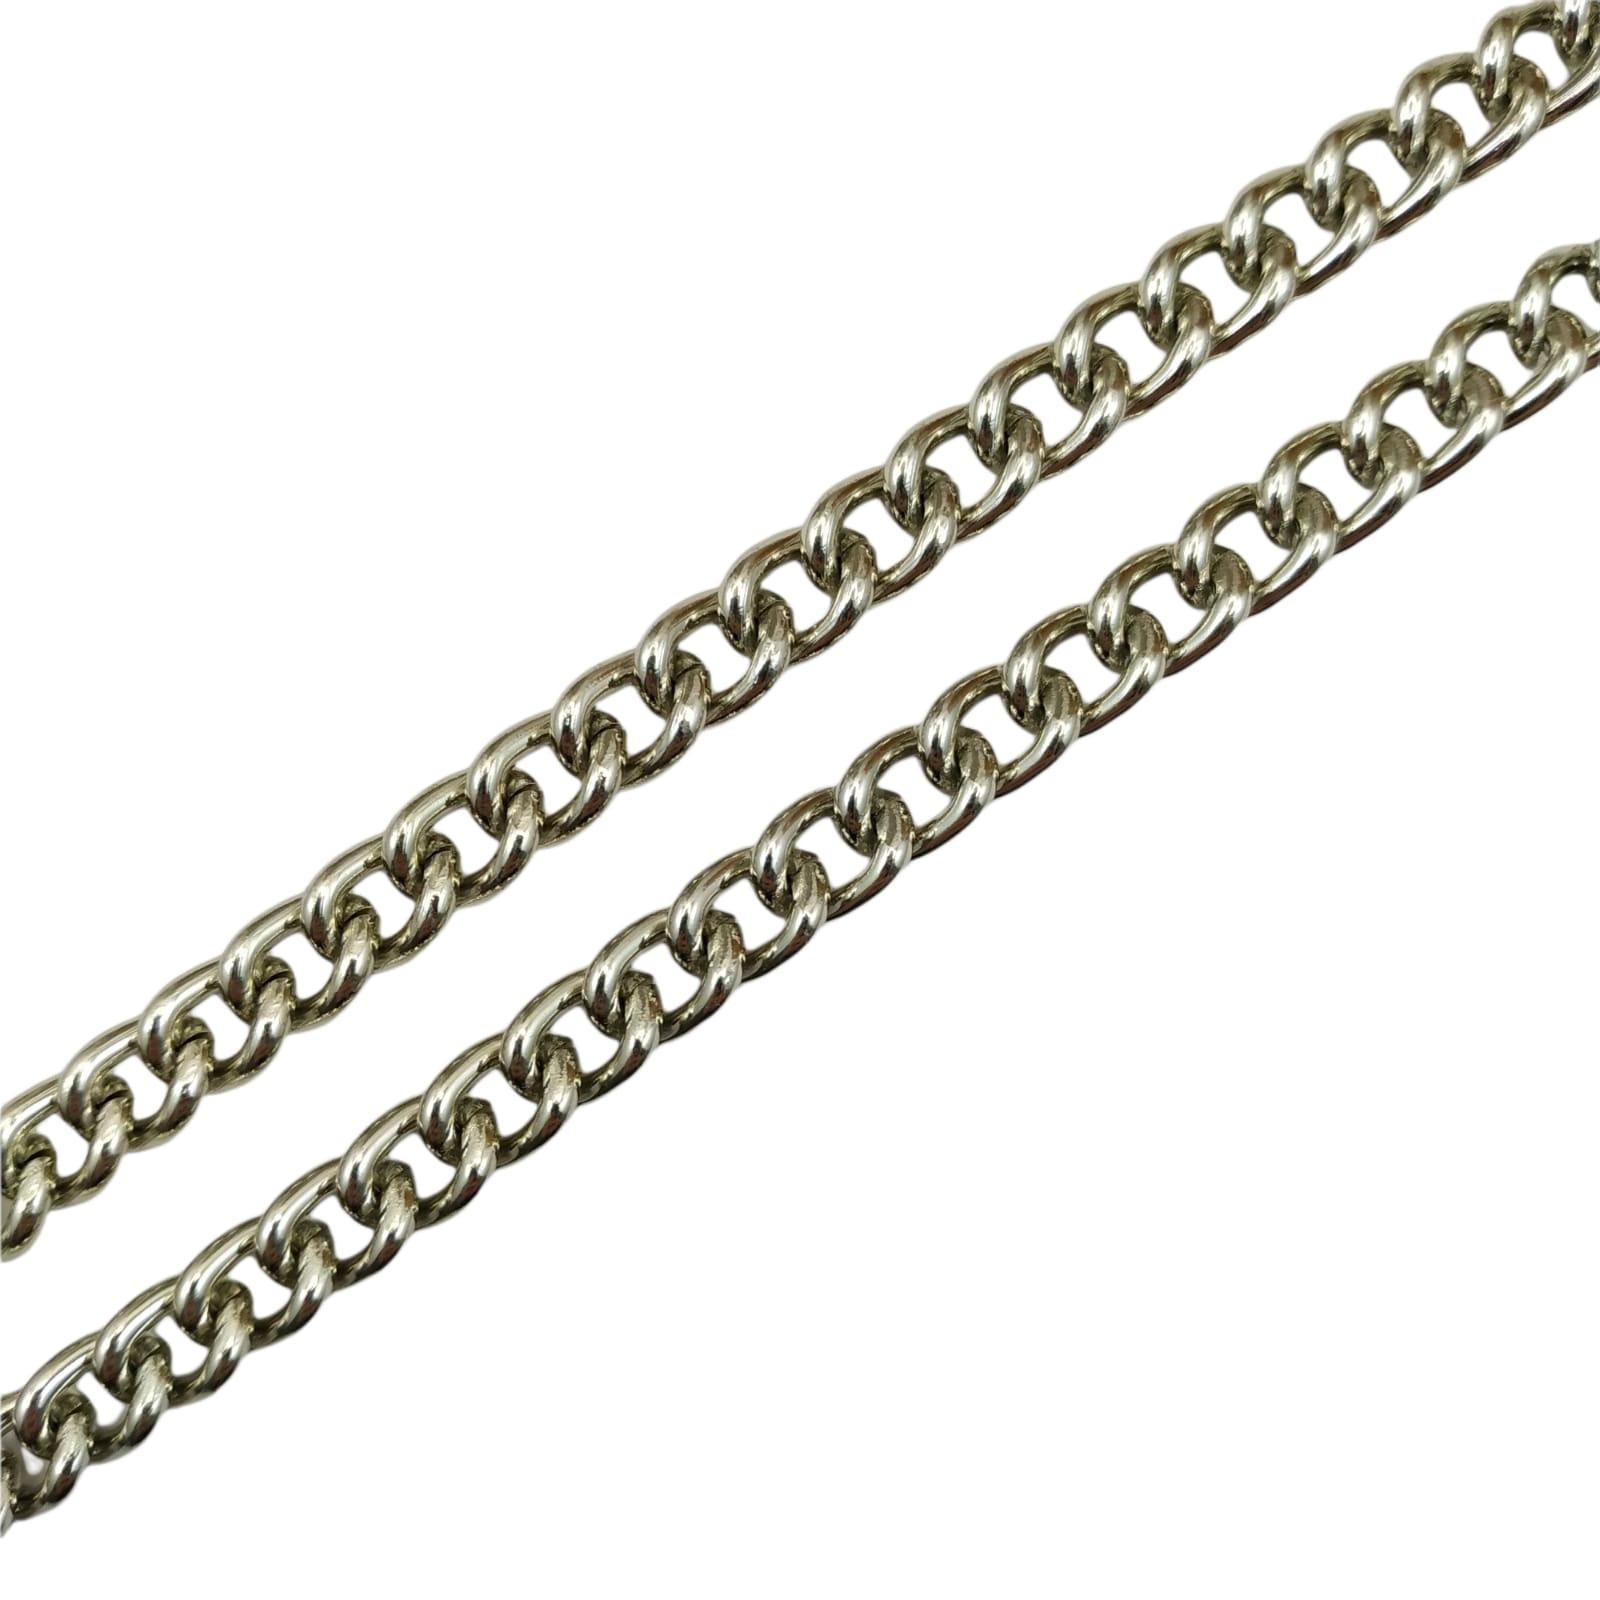 CR427 - Corrente de Alumínio 10mm Grume Fechada Prata - 1metro